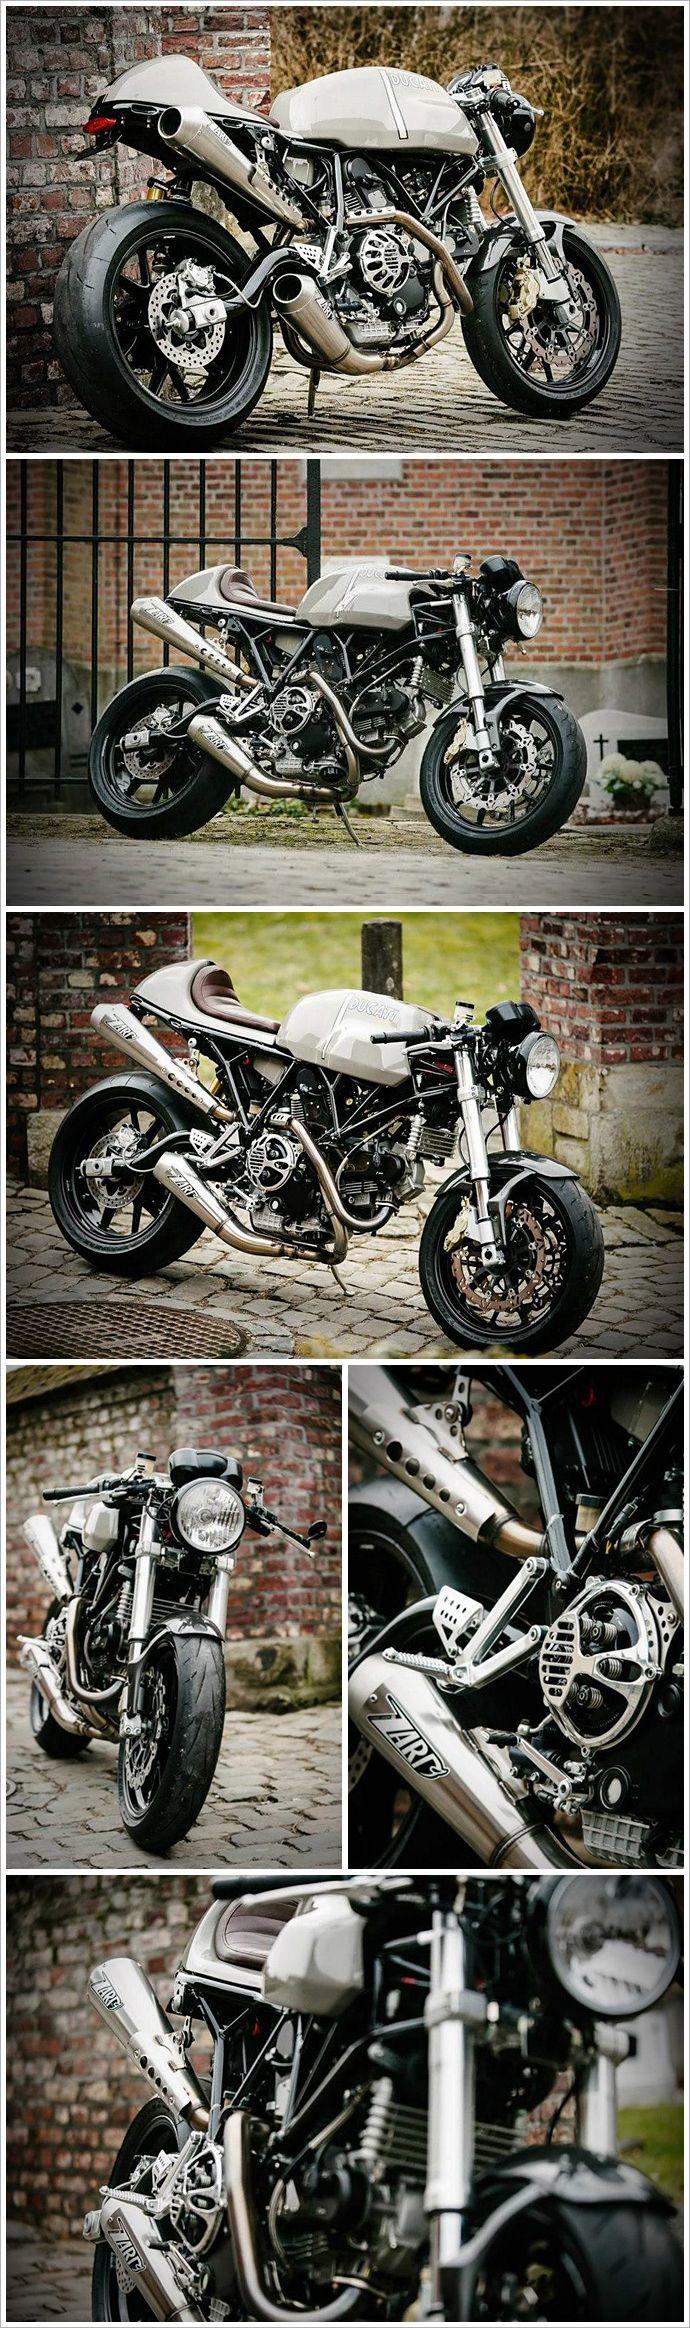 Awesome Ducati Sport Classic 1000!  http://www.pipeburn.com/home/2013/3/24/ducati-sport-classic-1000-the-flying-hermans-mc.html